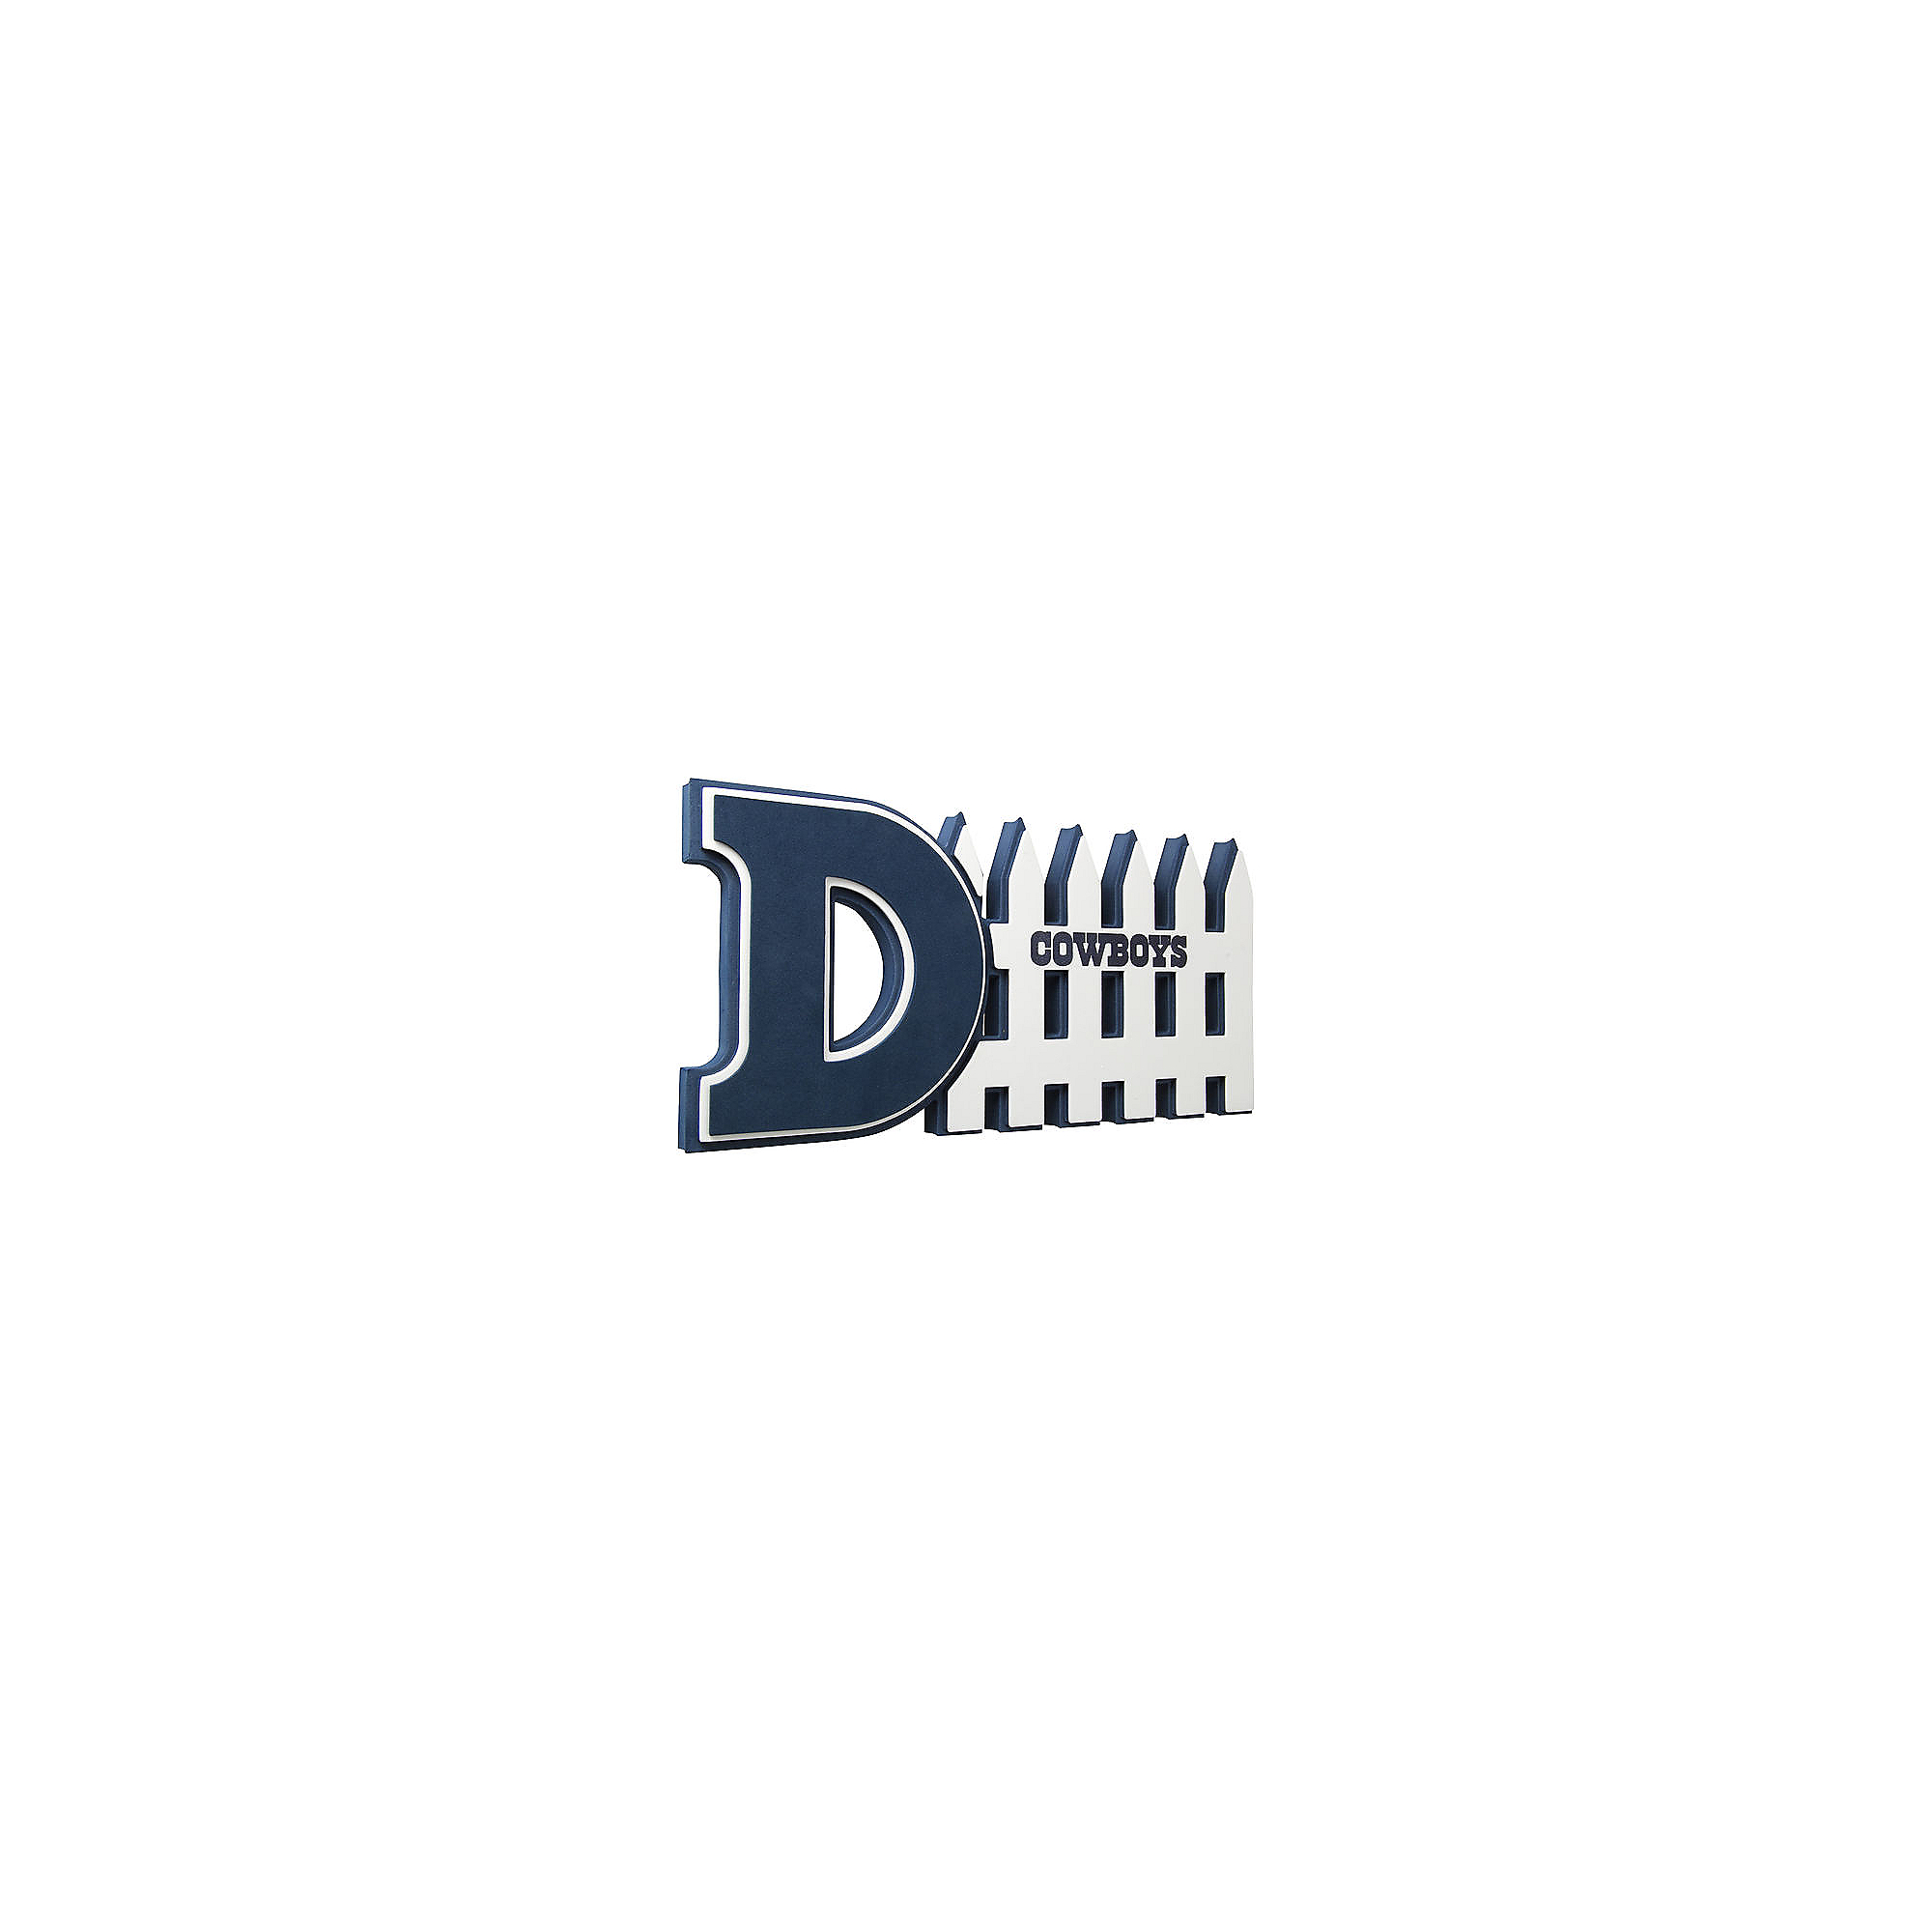 Dallas Cowboys D-Fence Foam Sign